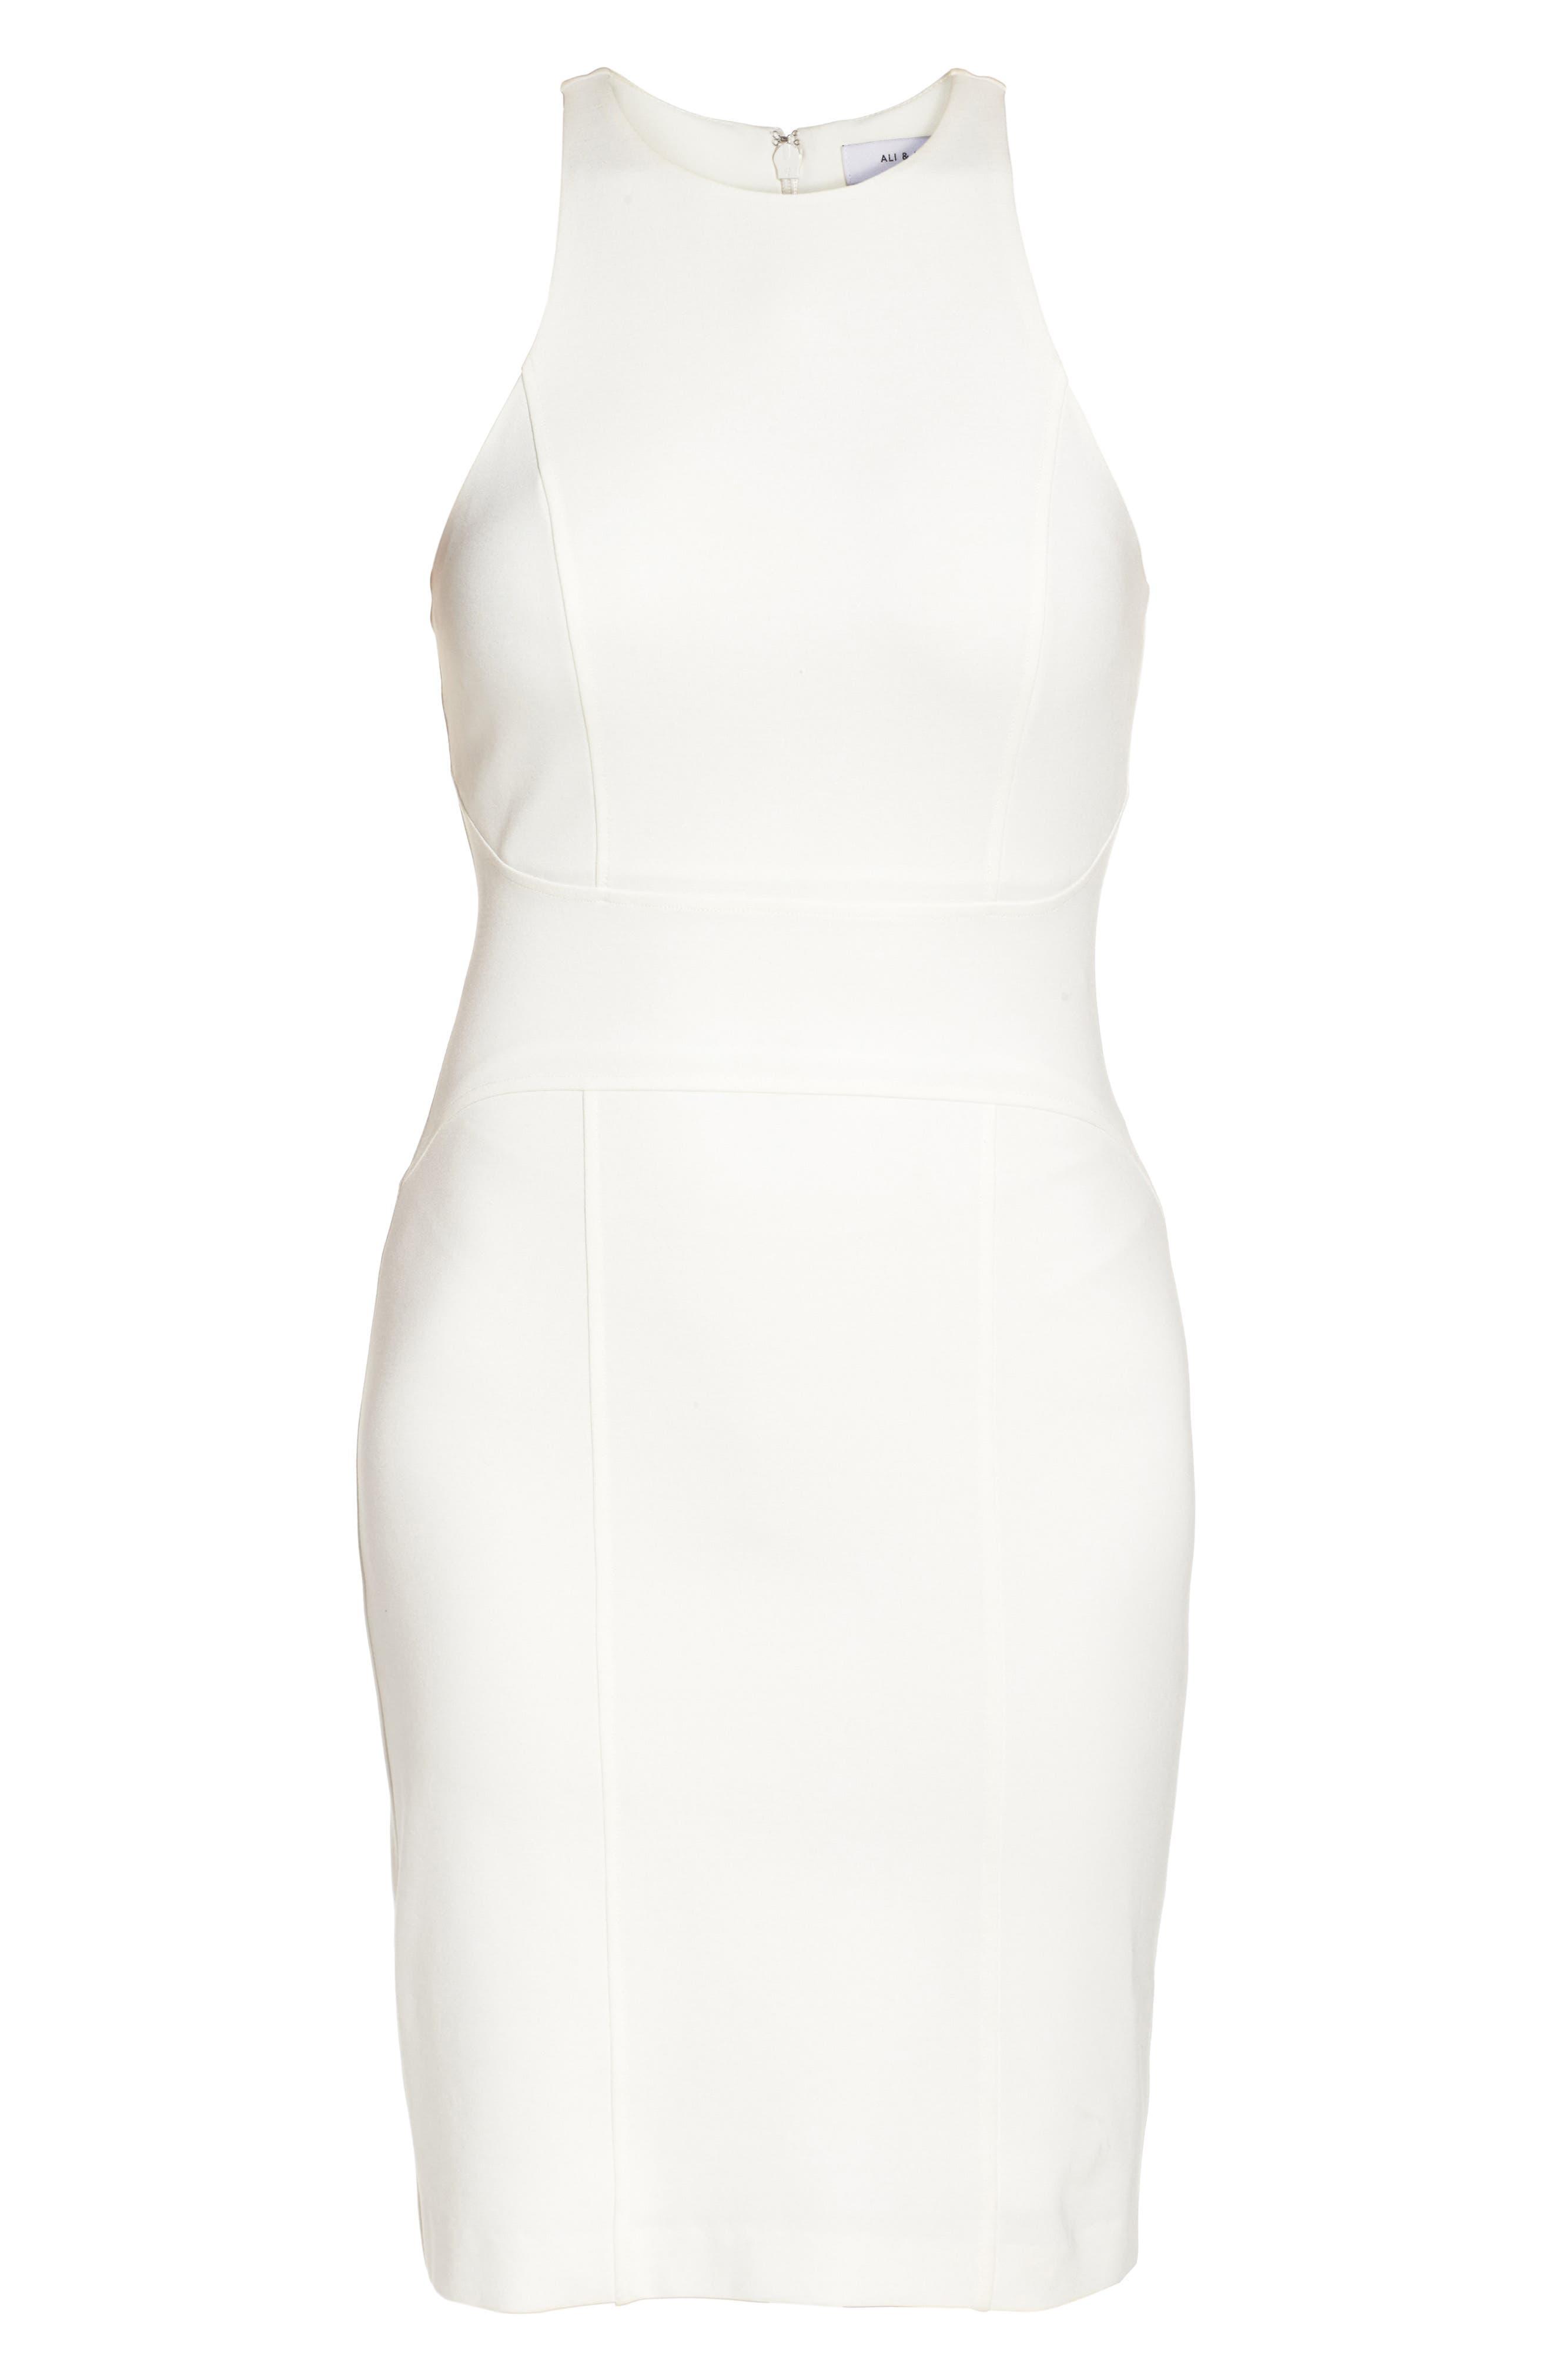 You Ruin Me Body-Con Dress,                             Alternate thumbnail 9, color,                             White